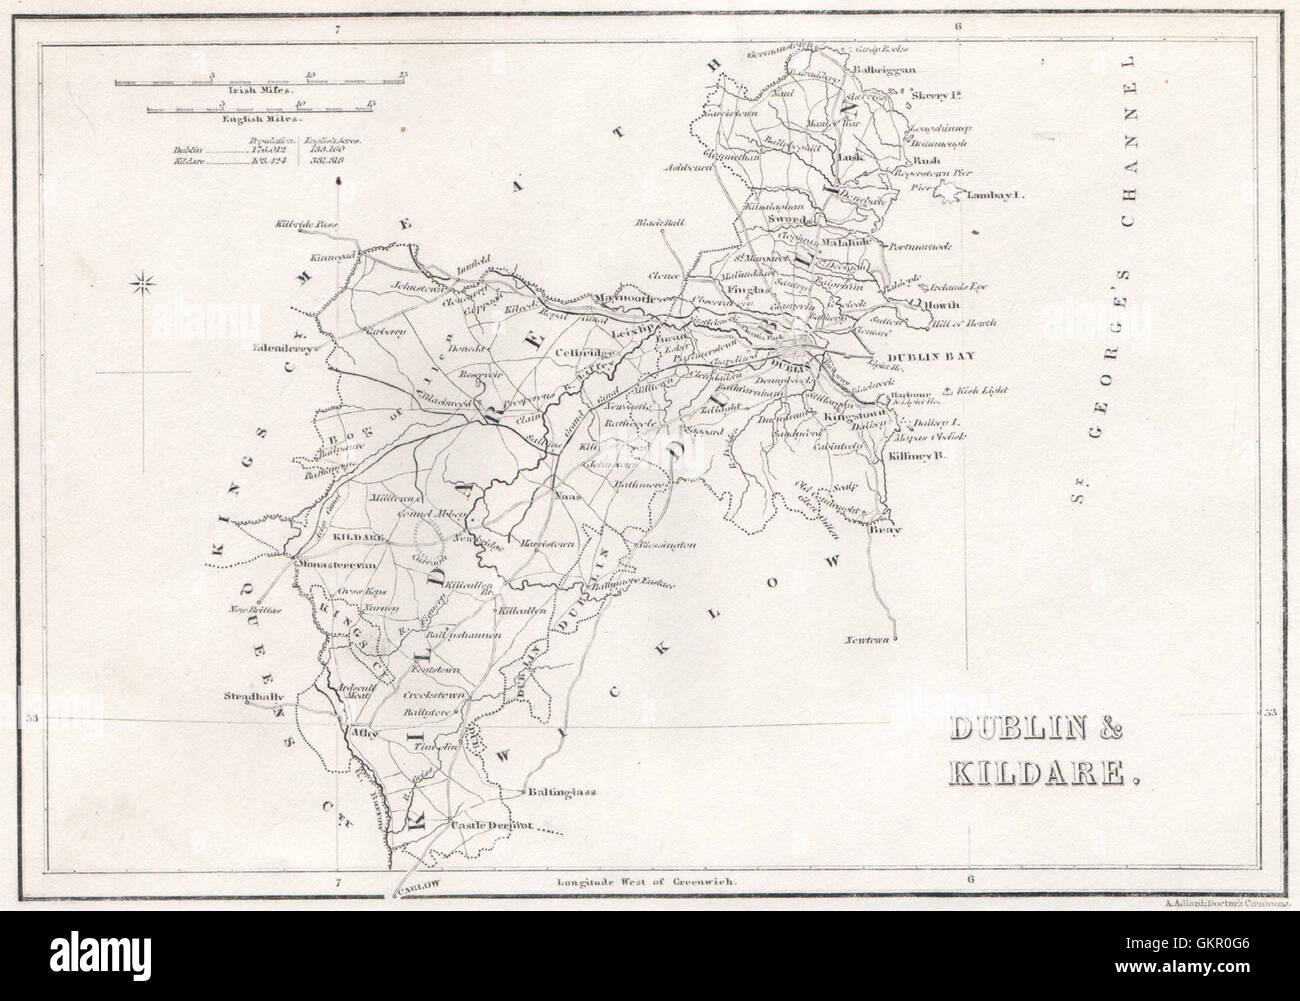 County Dublin County Kildare Ireland 1835 Antique Map Stock